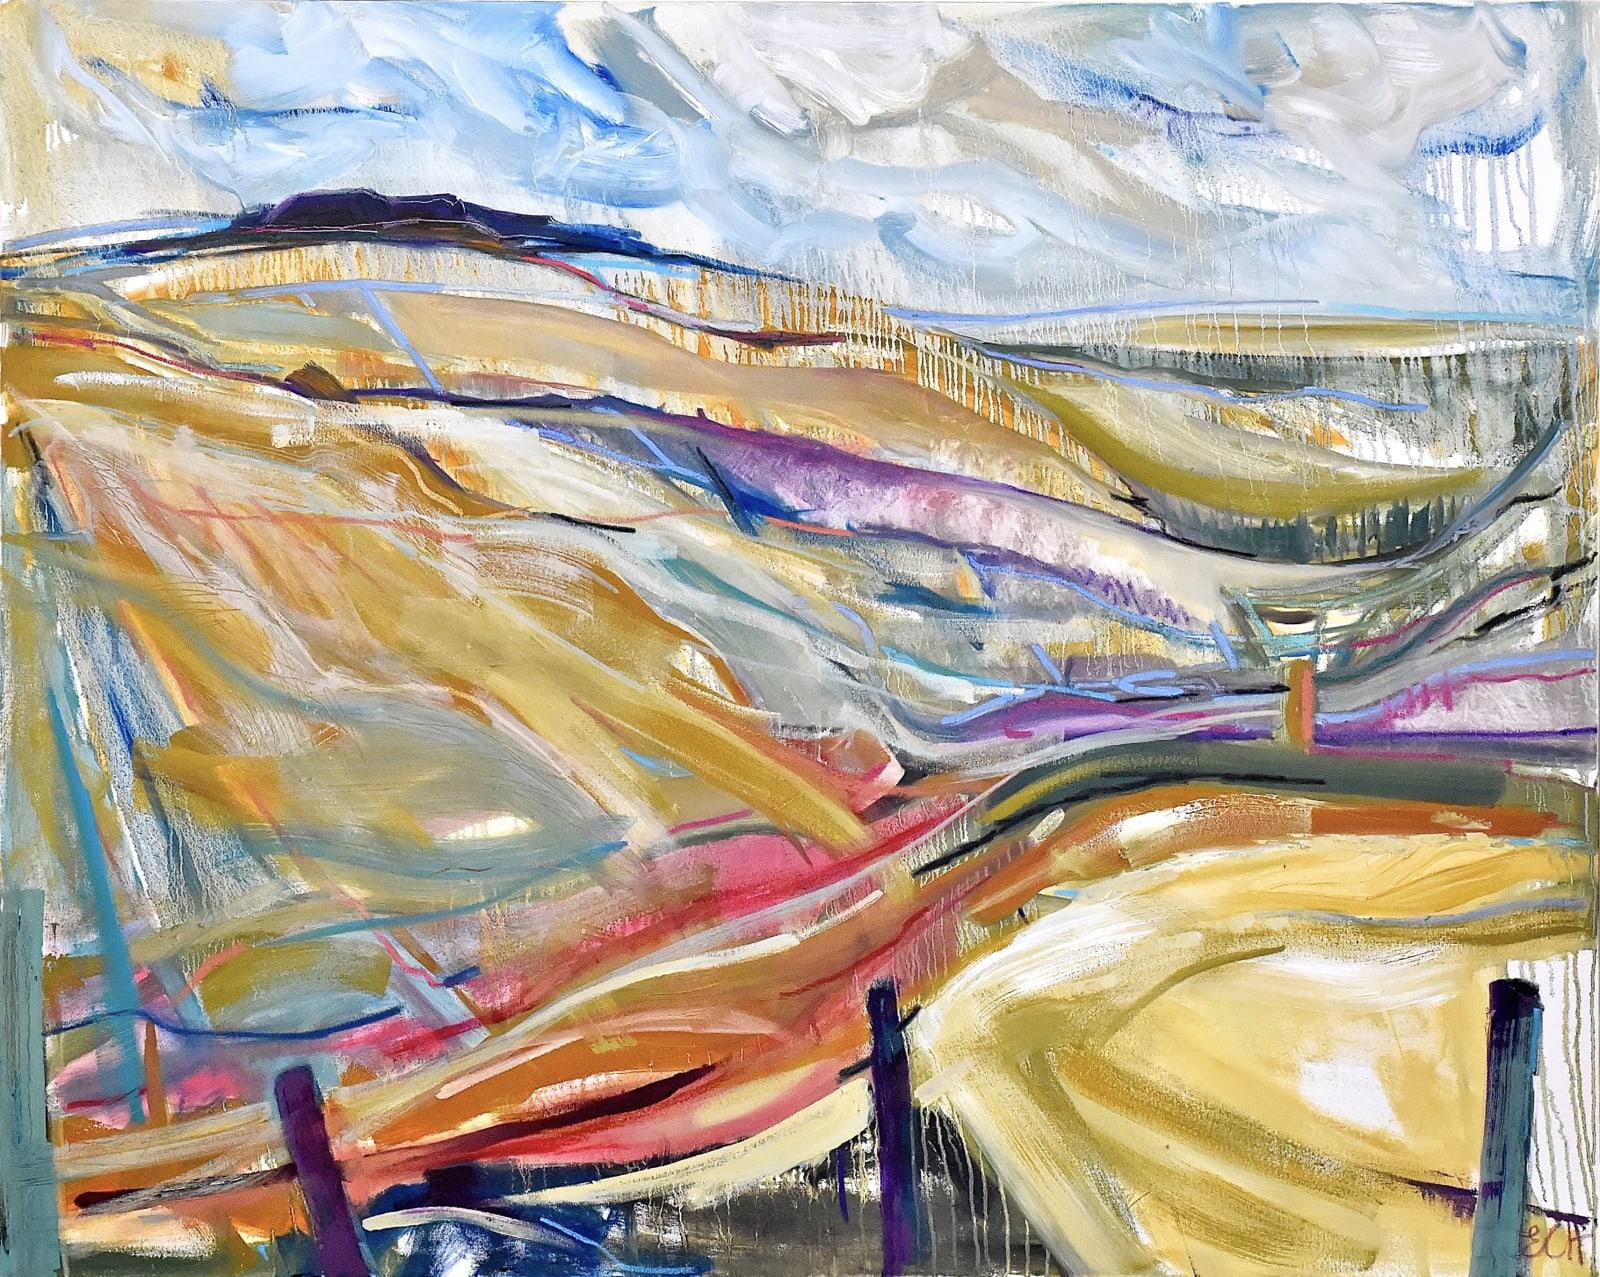 Emma Haggas, Looking to Hippenscombe Bottom